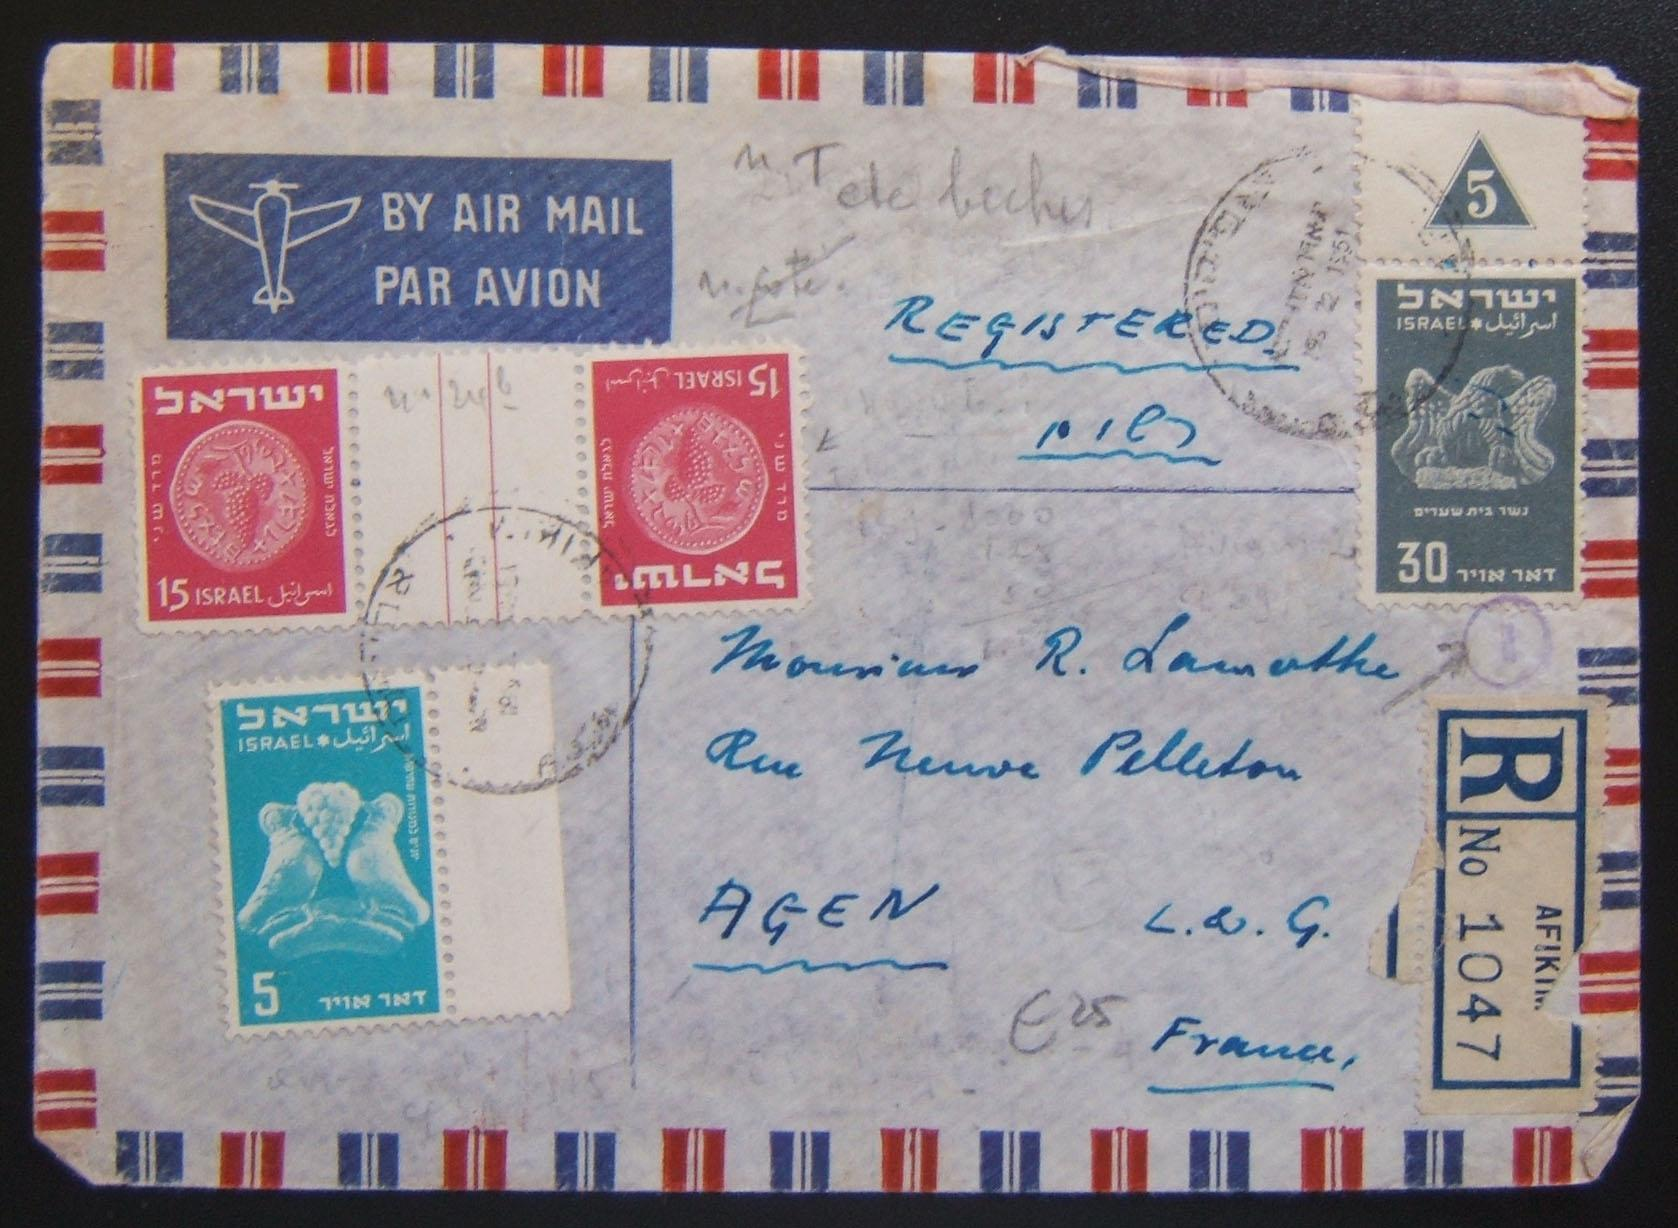 1951 mixed franking reg. airmail: 19-2-1951 reg. comm a/m cv ex AFIKIM to FRANCE franked 65pr per FA-2a period rate (40pr letter + 25pr reg fee) using mix of 1949 2nd Coinage 15pr